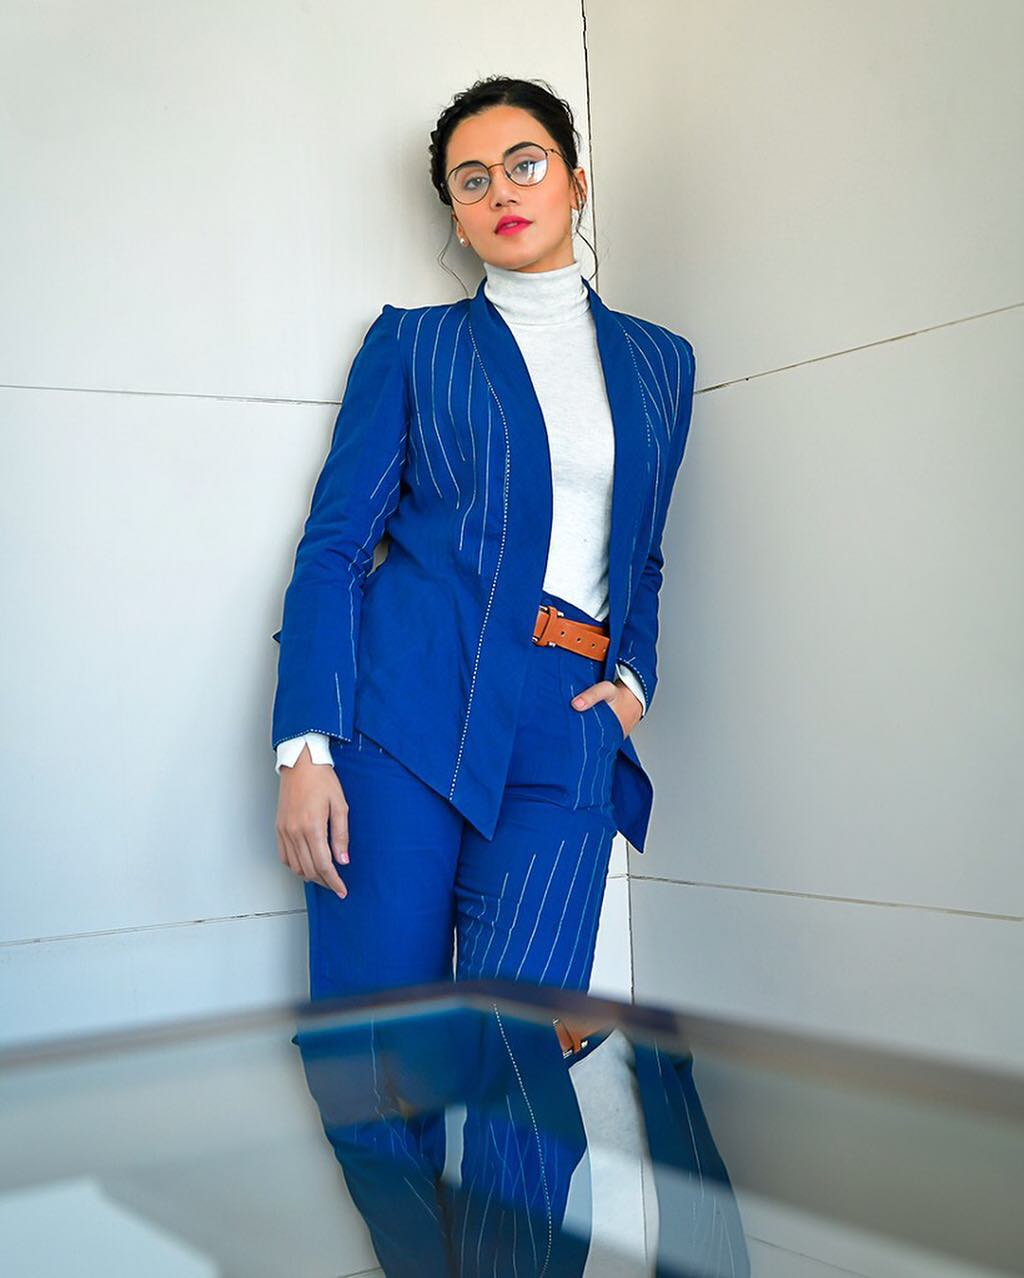 Tapsee Pannu Beautiful Pics - HD Actress Photo